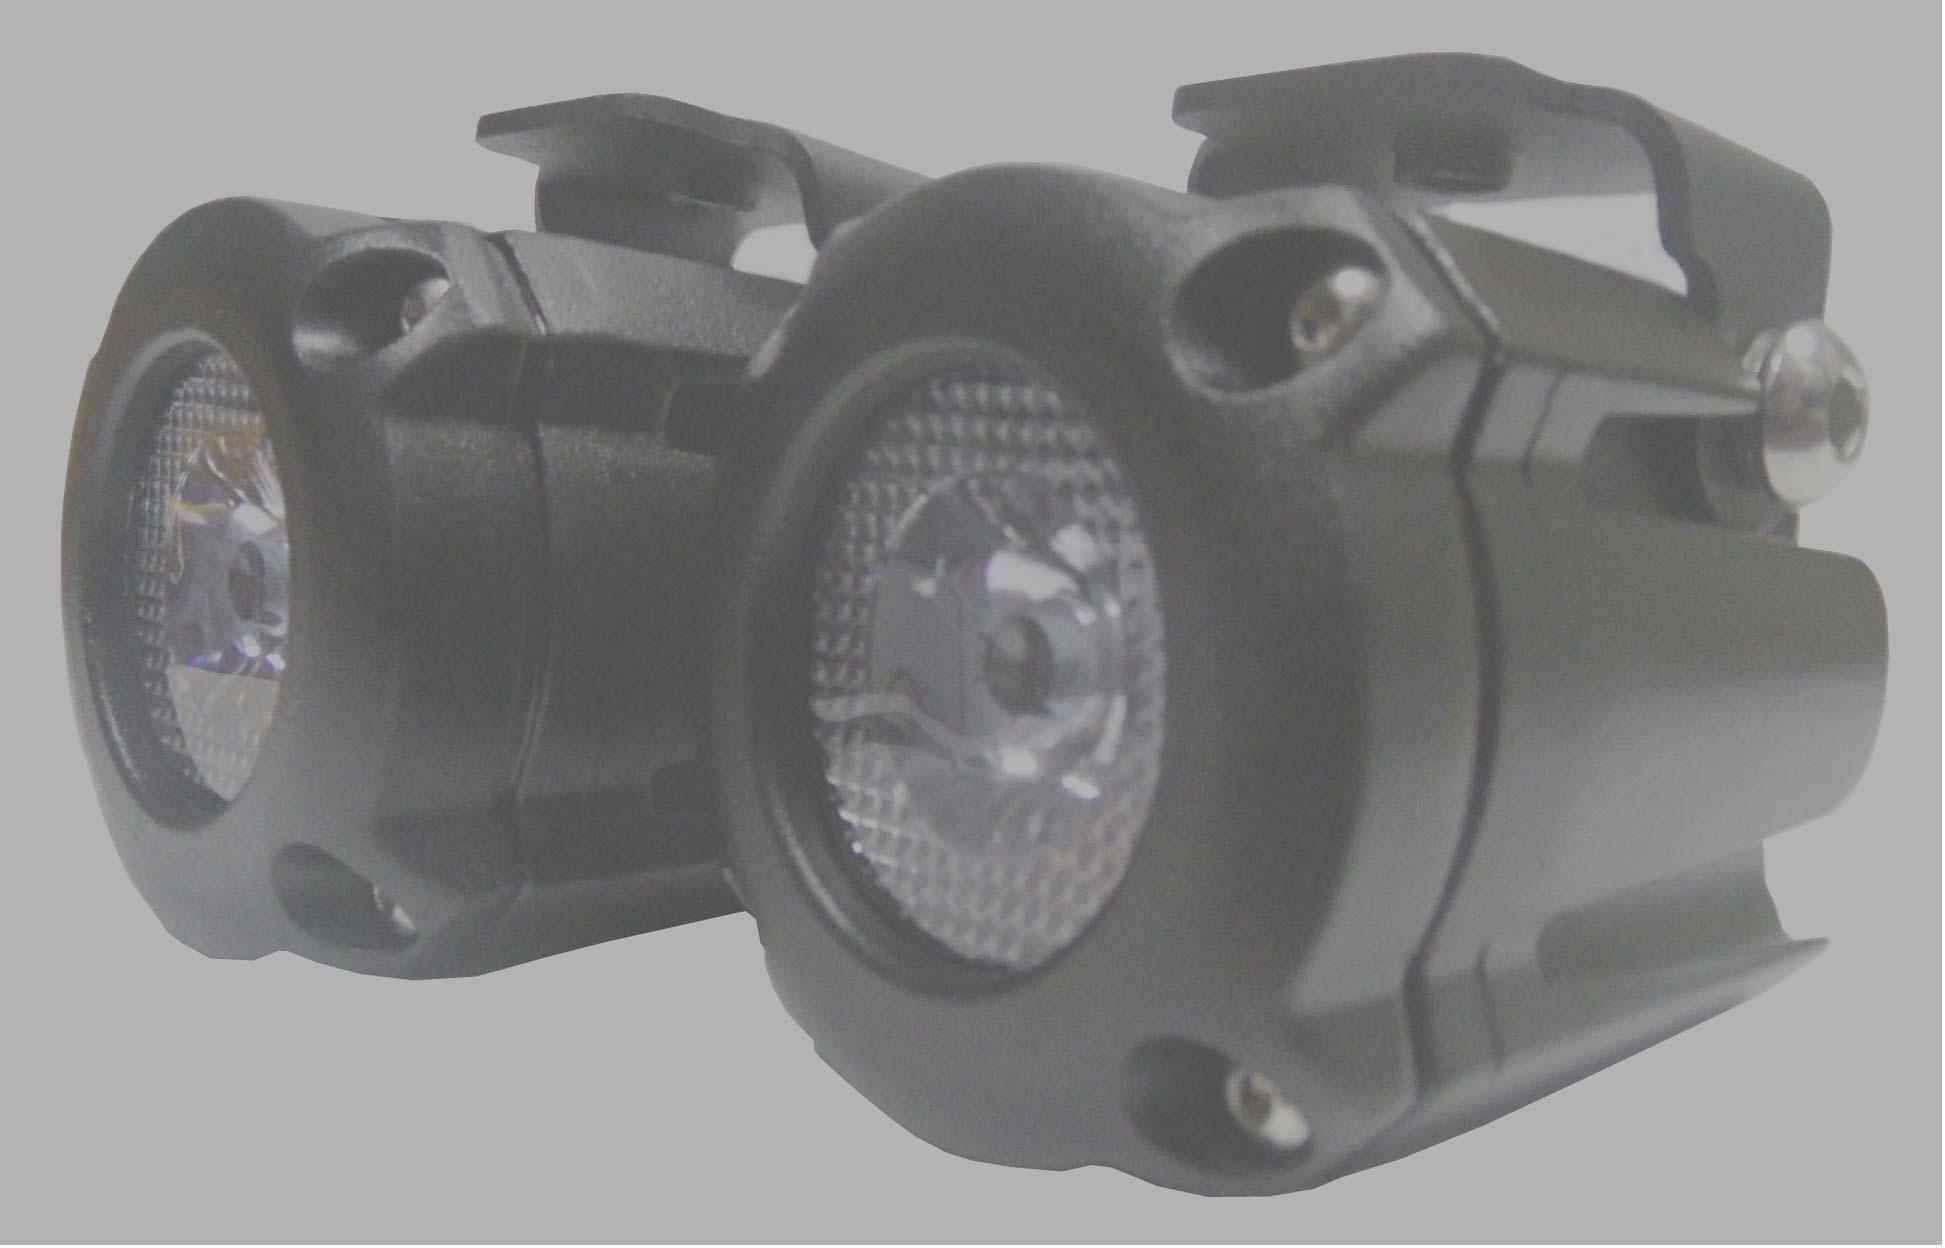 Motorcycle Auxiliary Driving Lights Bikegear 100 Watt Spotlight Wiring Diagram